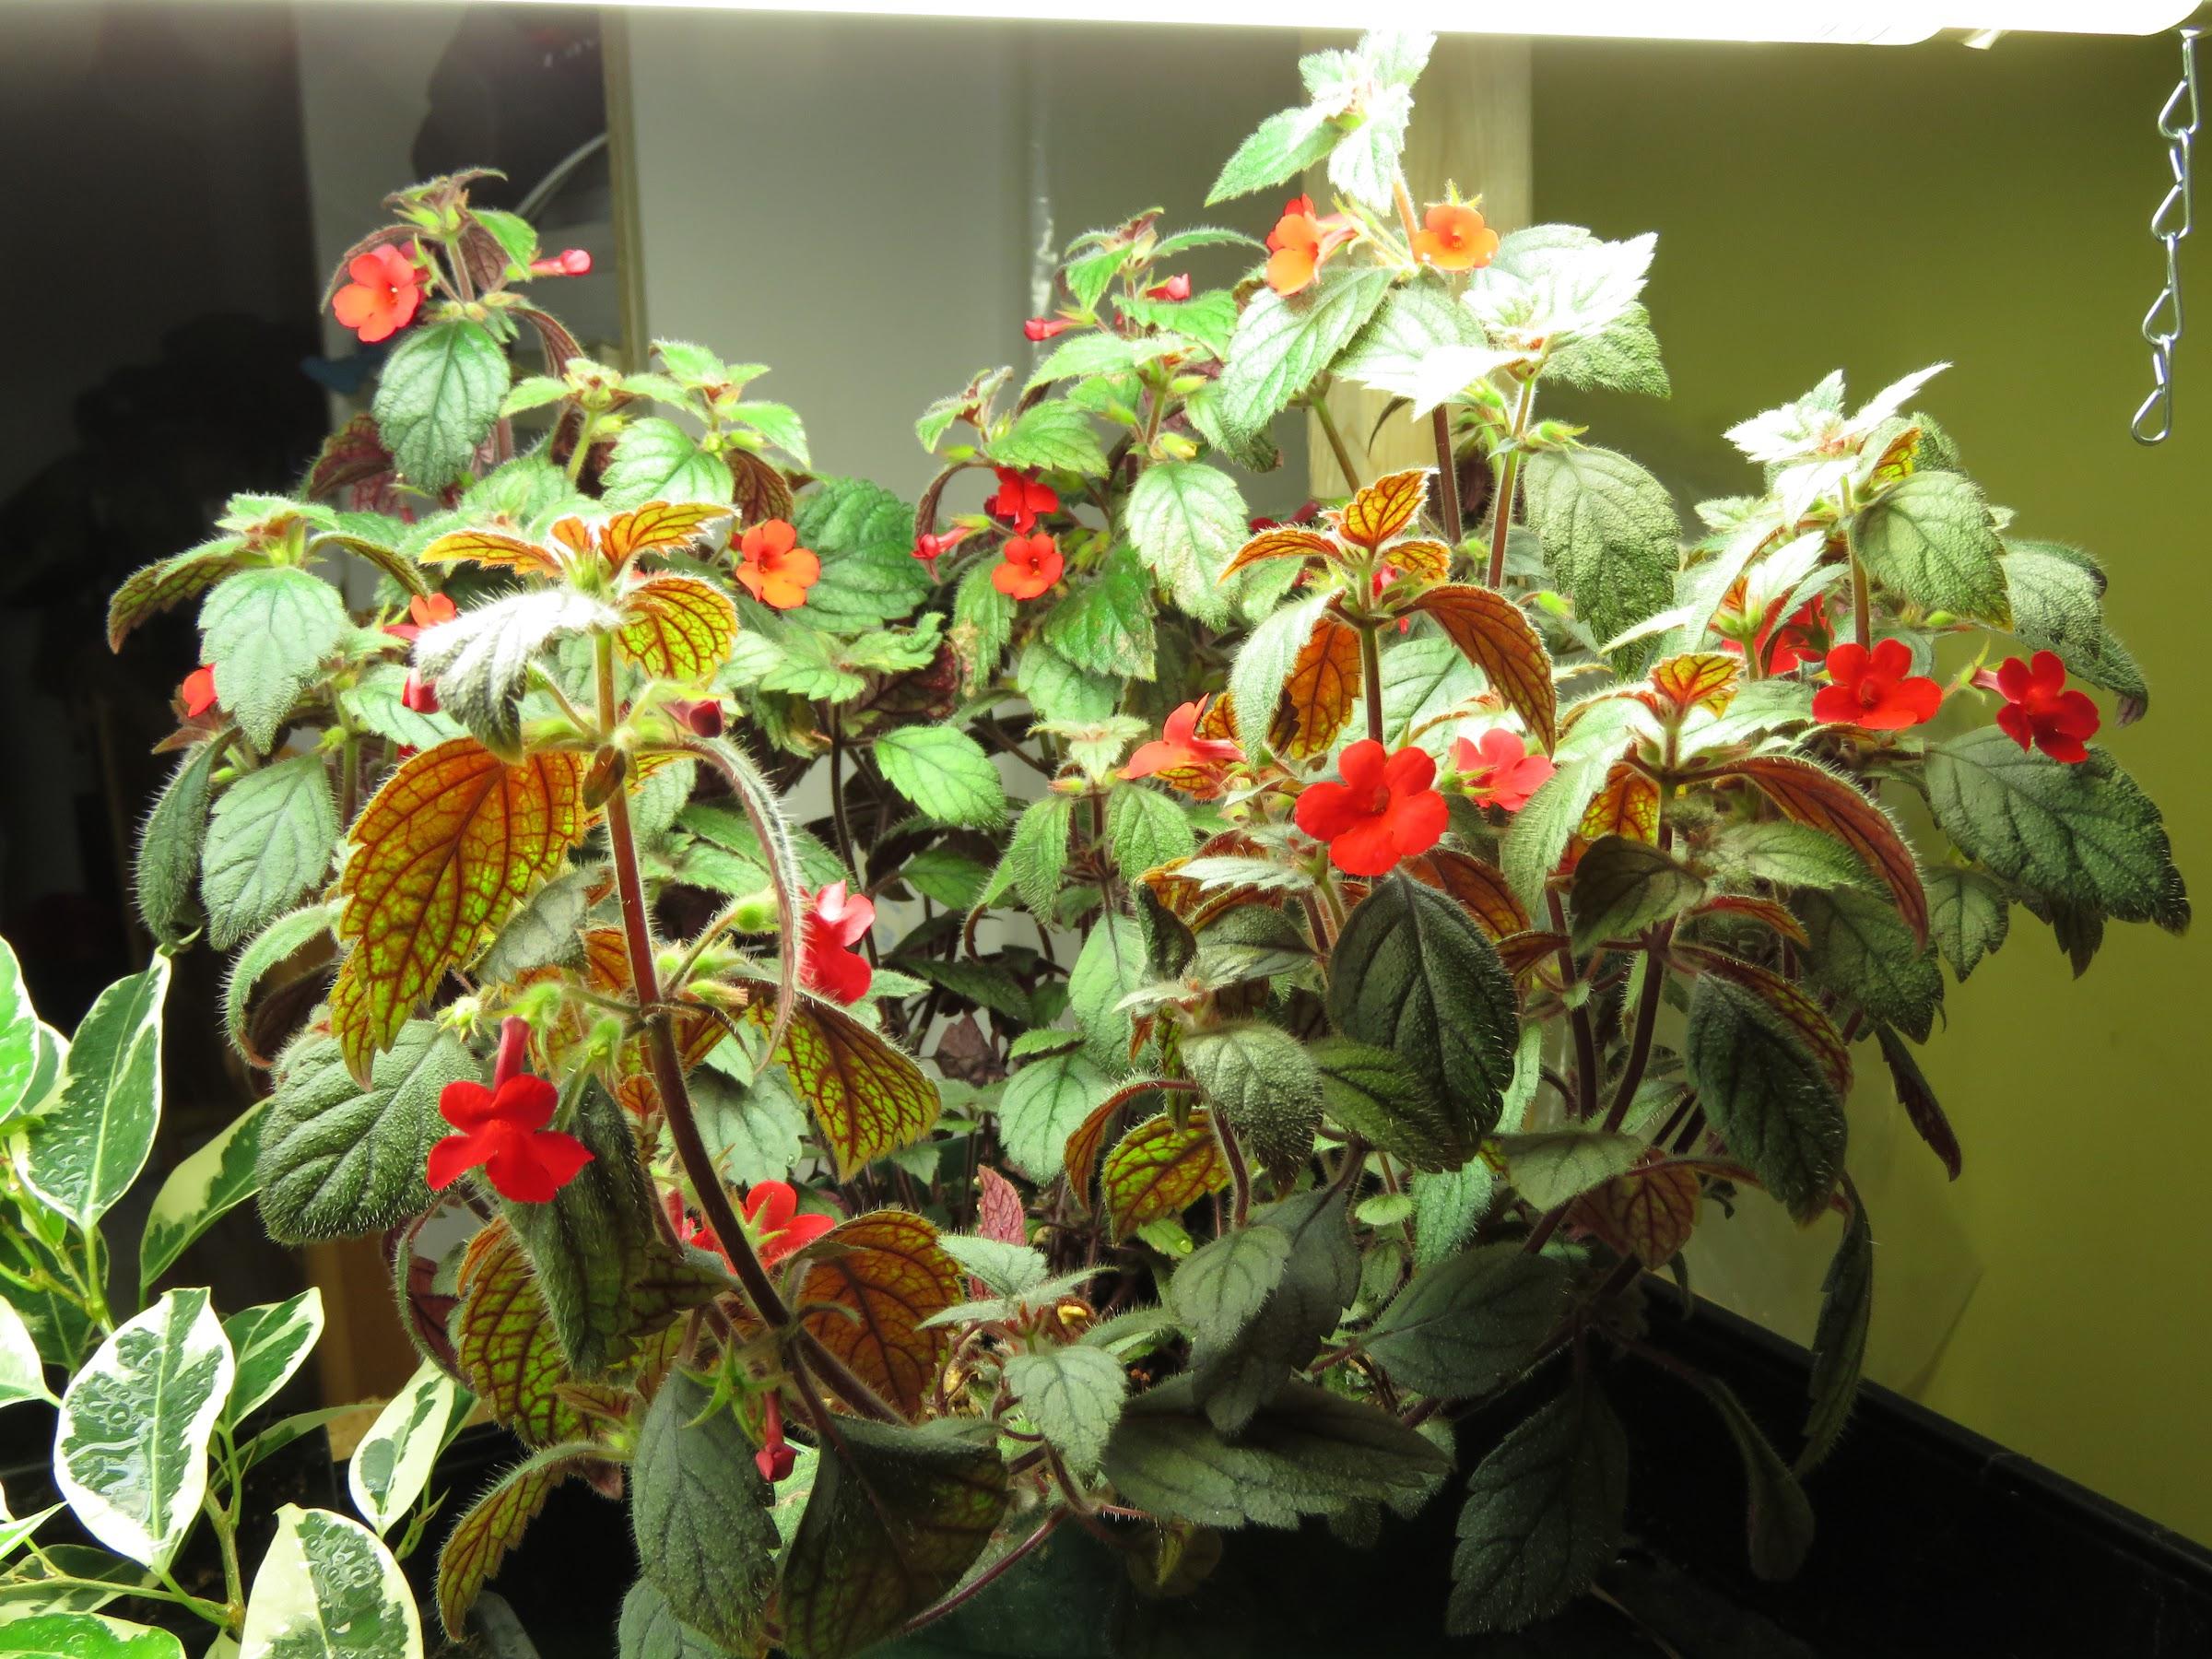 Autres plantes chez Grigri AgAAL8BpR6S8tWavKFEacN_j-LNOgNBiWAF0r0M-gV2xtrlaXYFfU1tzRumtS6u4fJUqqekgGJMvbbqyoIFGa8OL7XMW9KEO55lEDq8pRzGb7GGVMKhzlydD7c_gKhplwBEO5zPf3o4=w2400